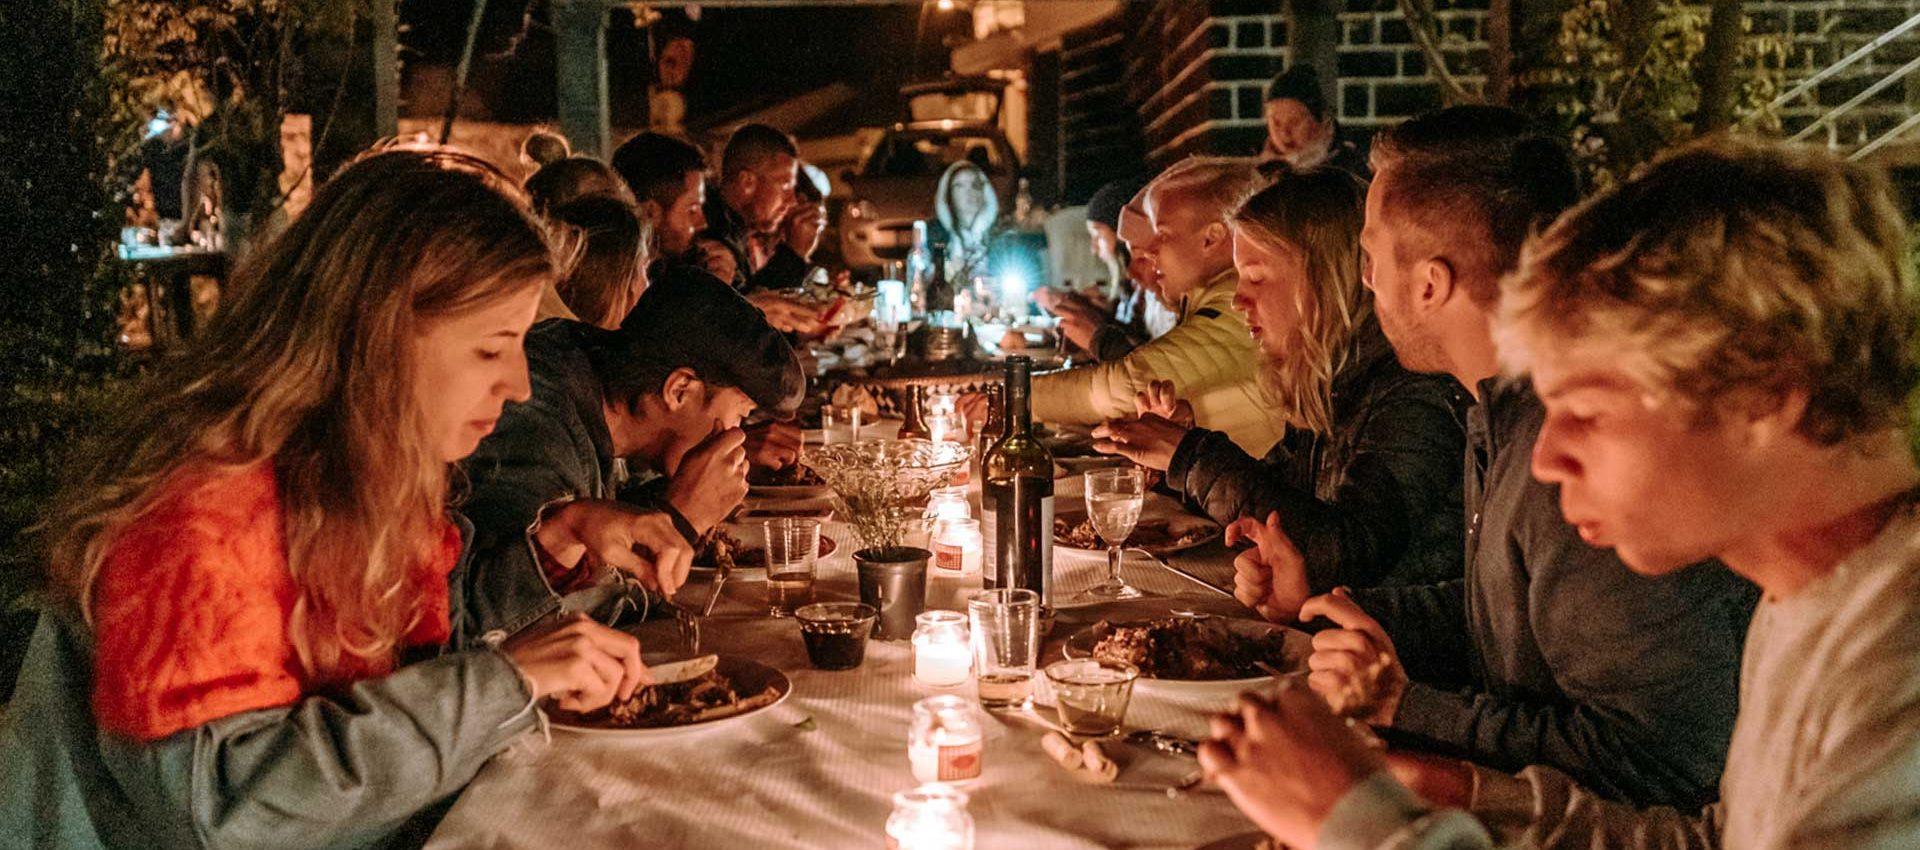 We will enjoy gourmet dinners at the best venues of São Miguel.